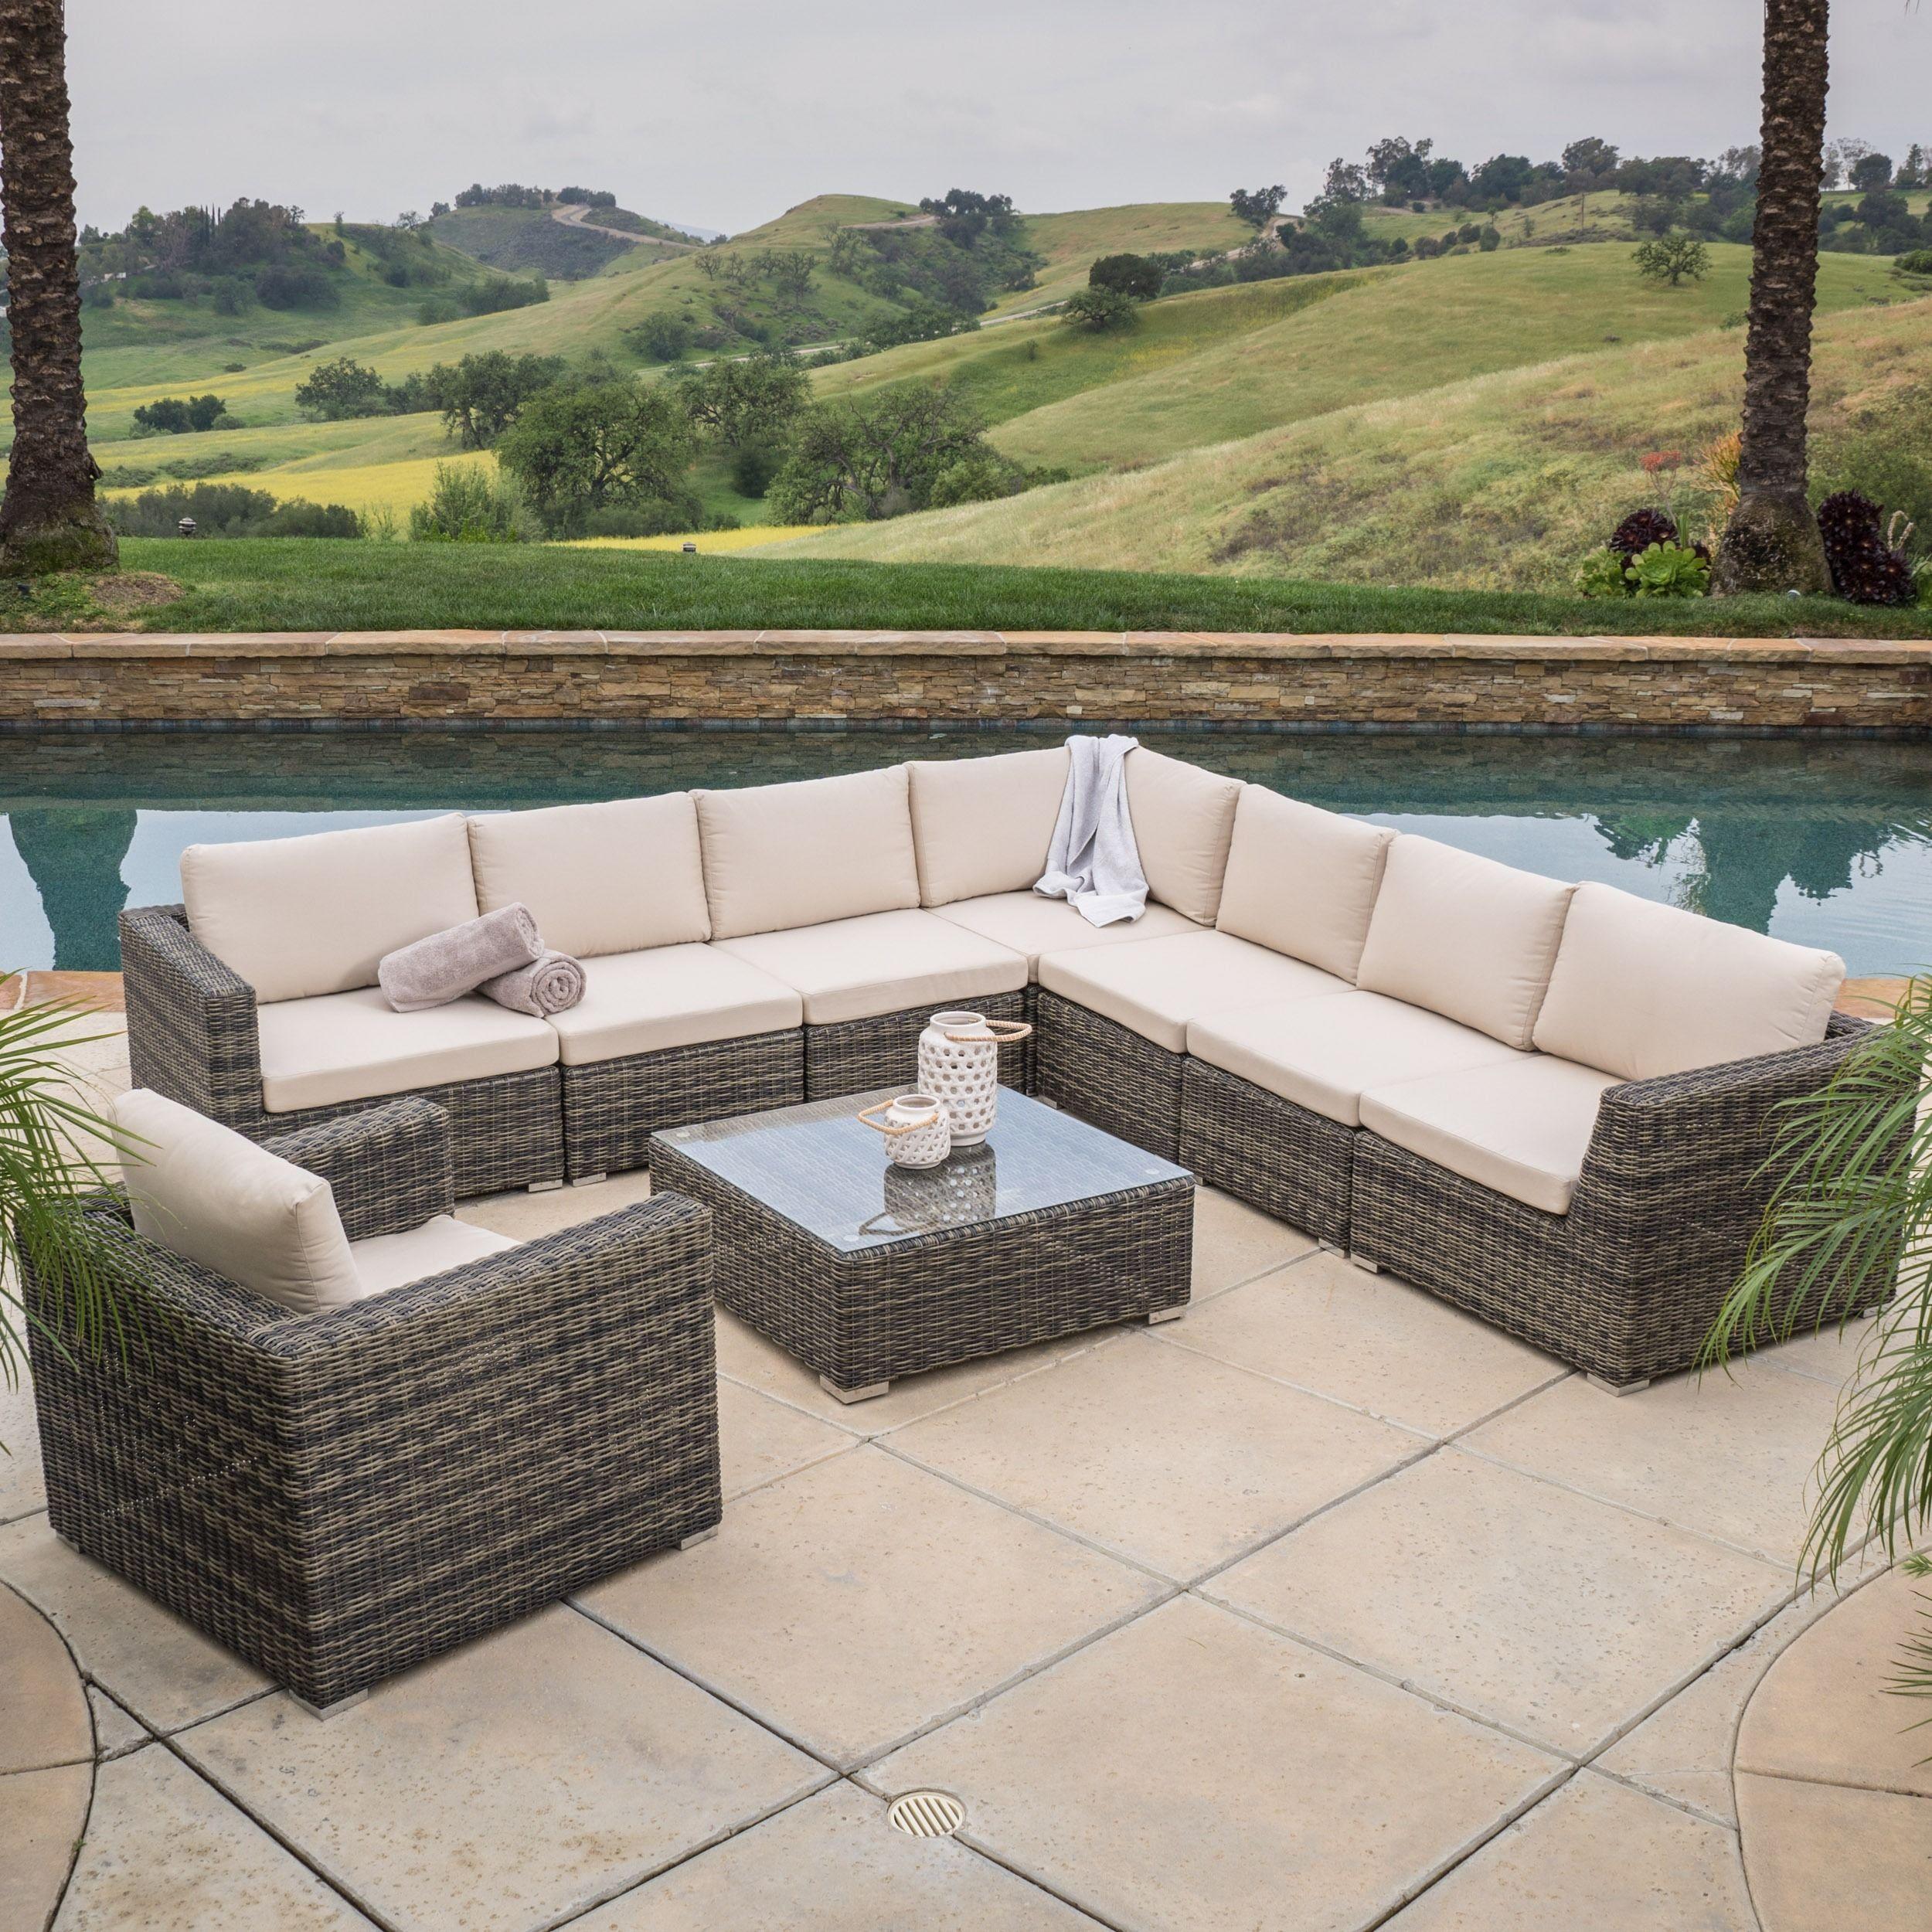 The Santa Rosa 9 Piece Outdoor Sofa Sectional Set Allows You To